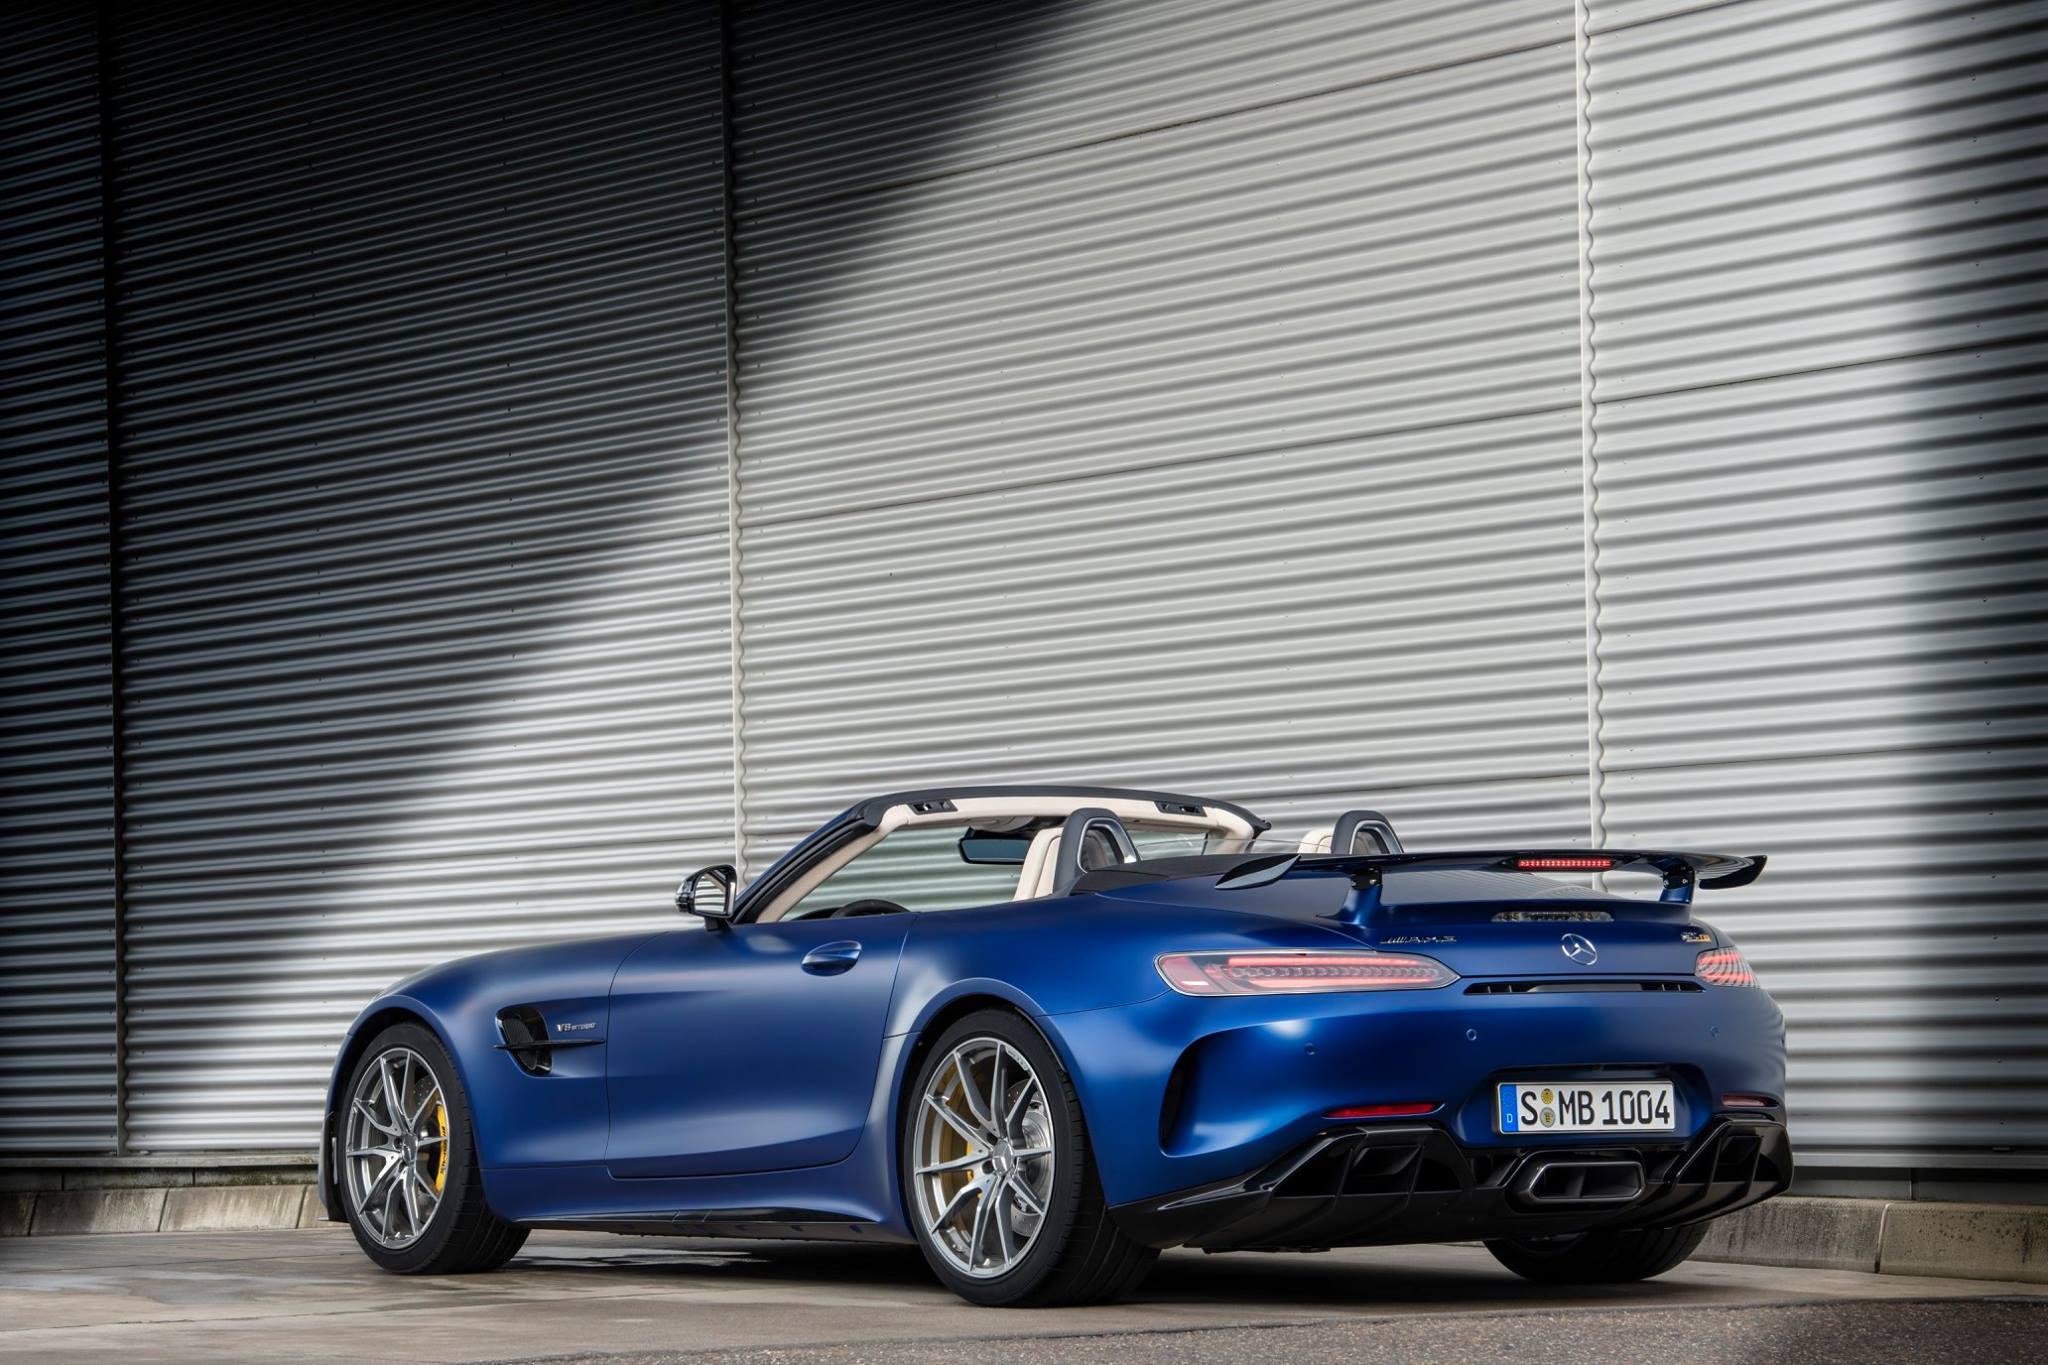 Mercedes-AMG-GTR-Roadster_acsptours3